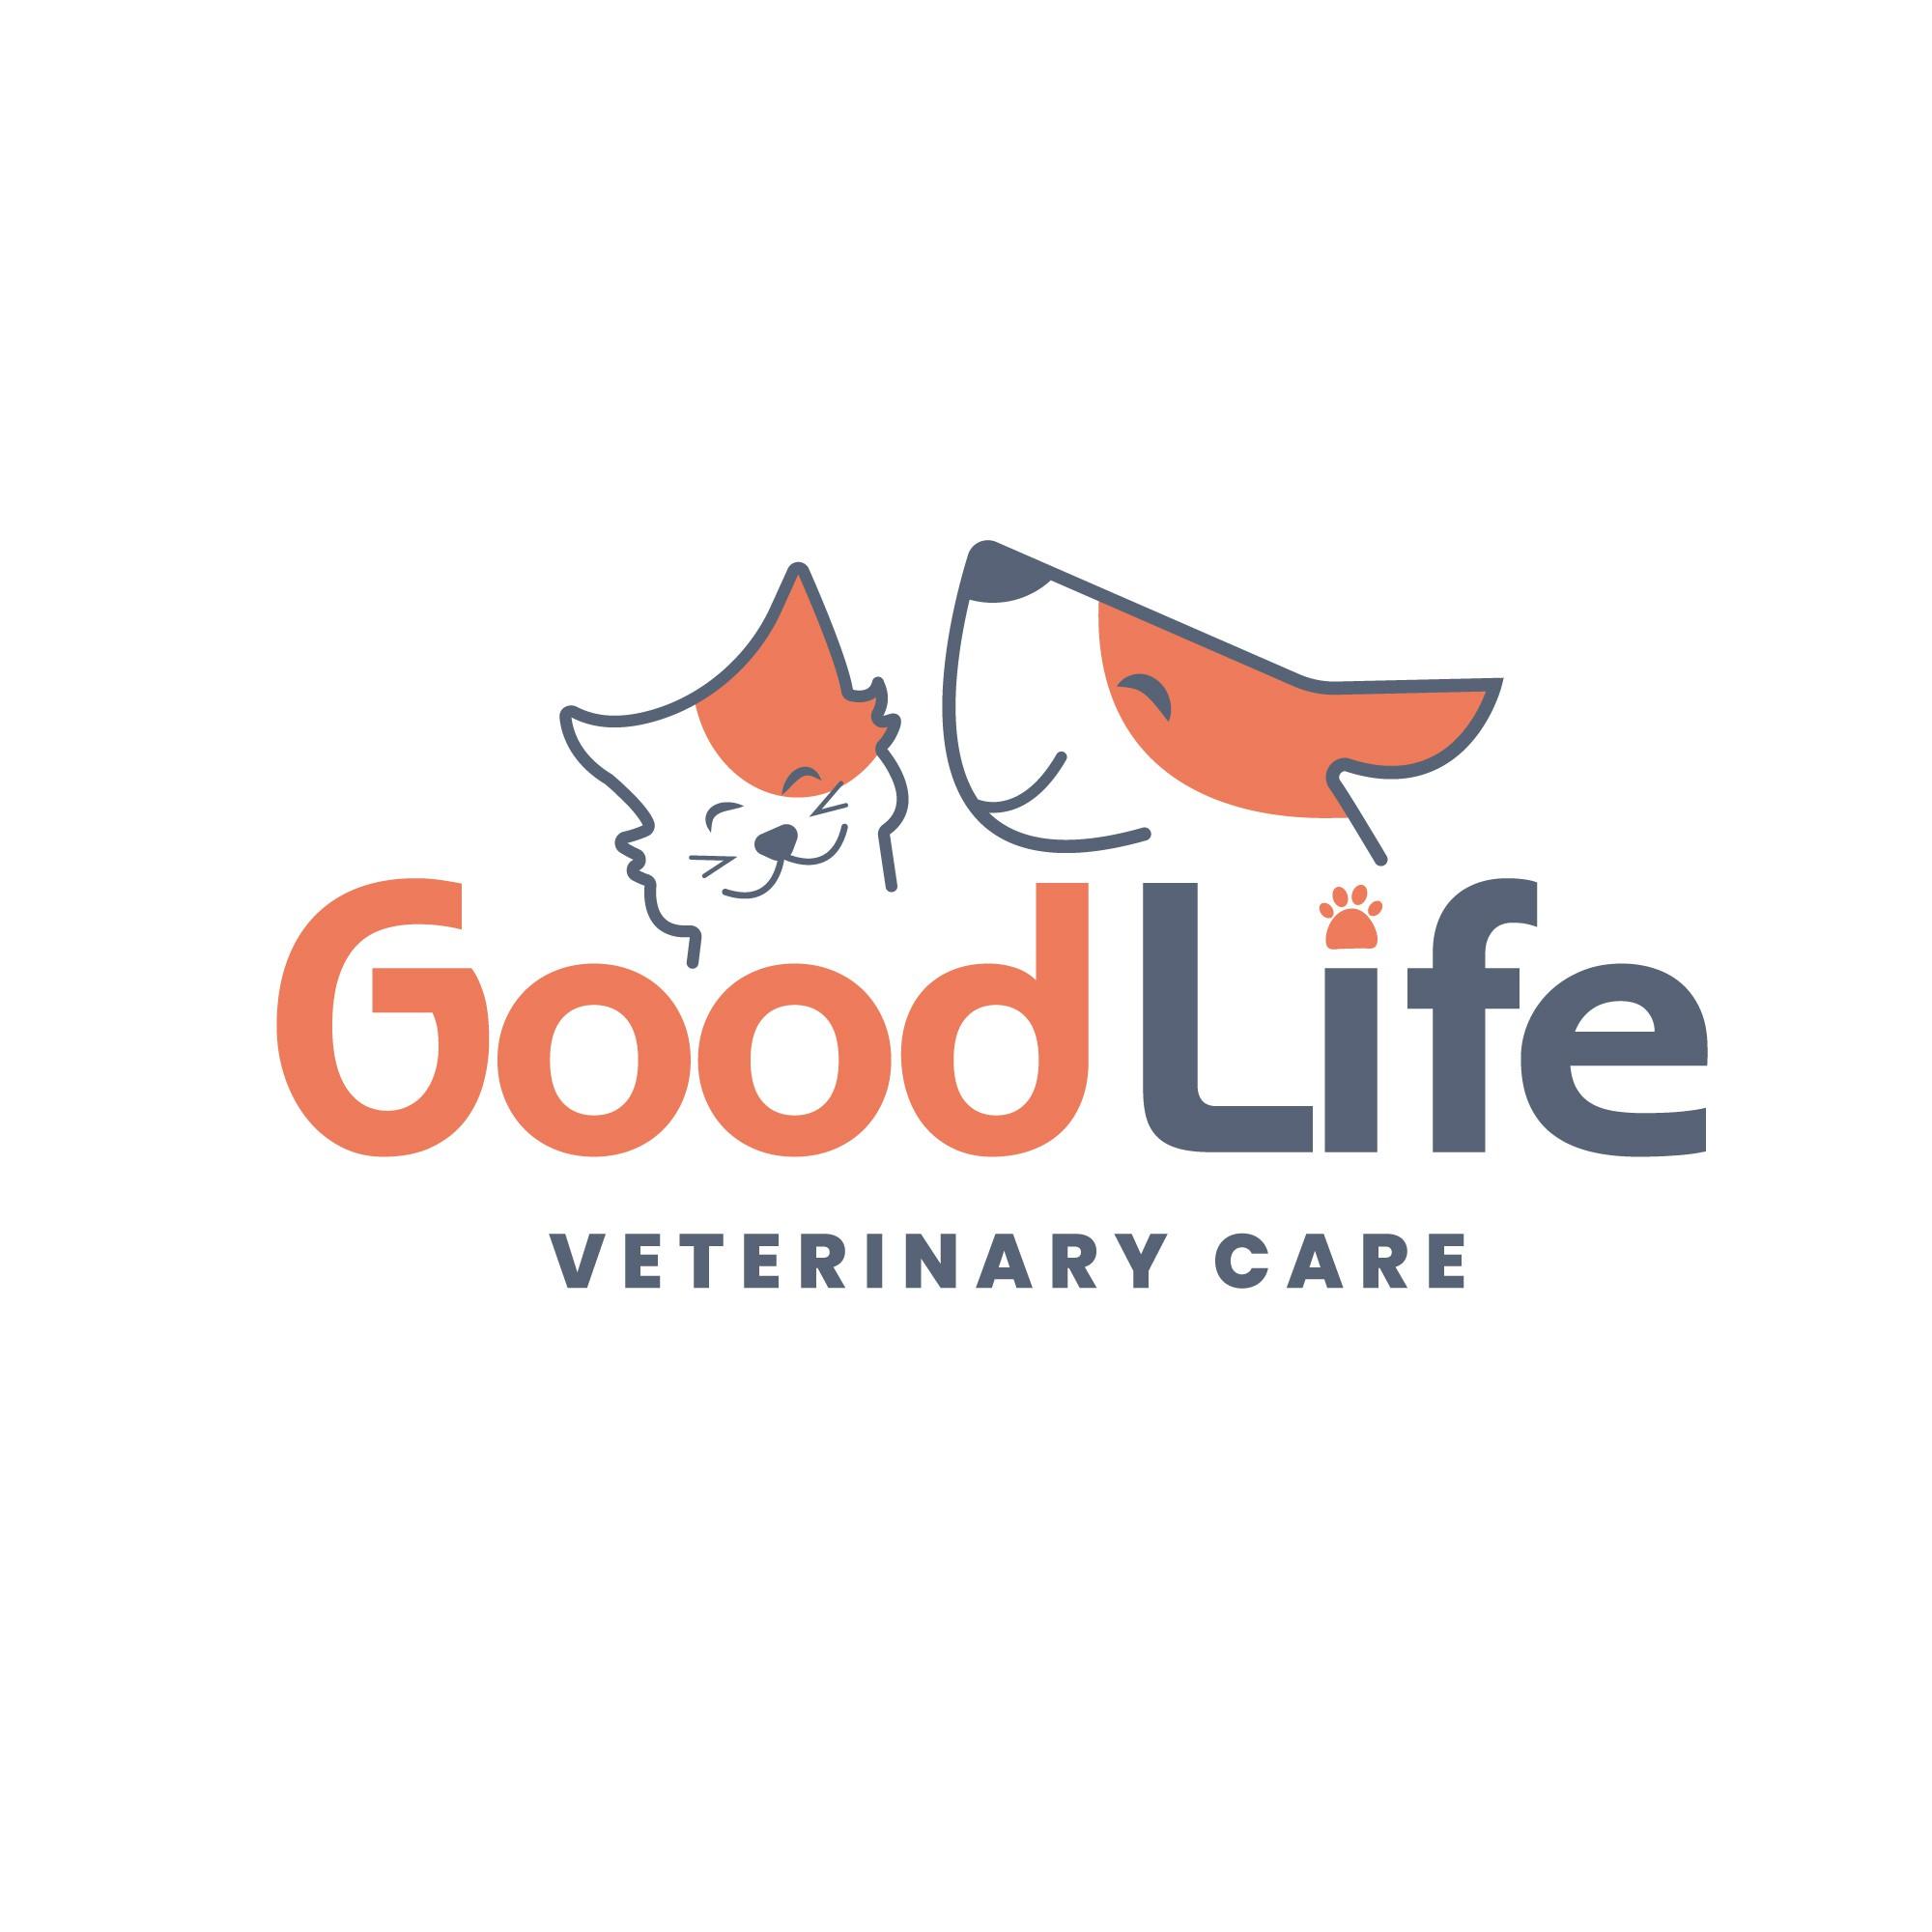 Good Life Veterinary Care needs a great logo!